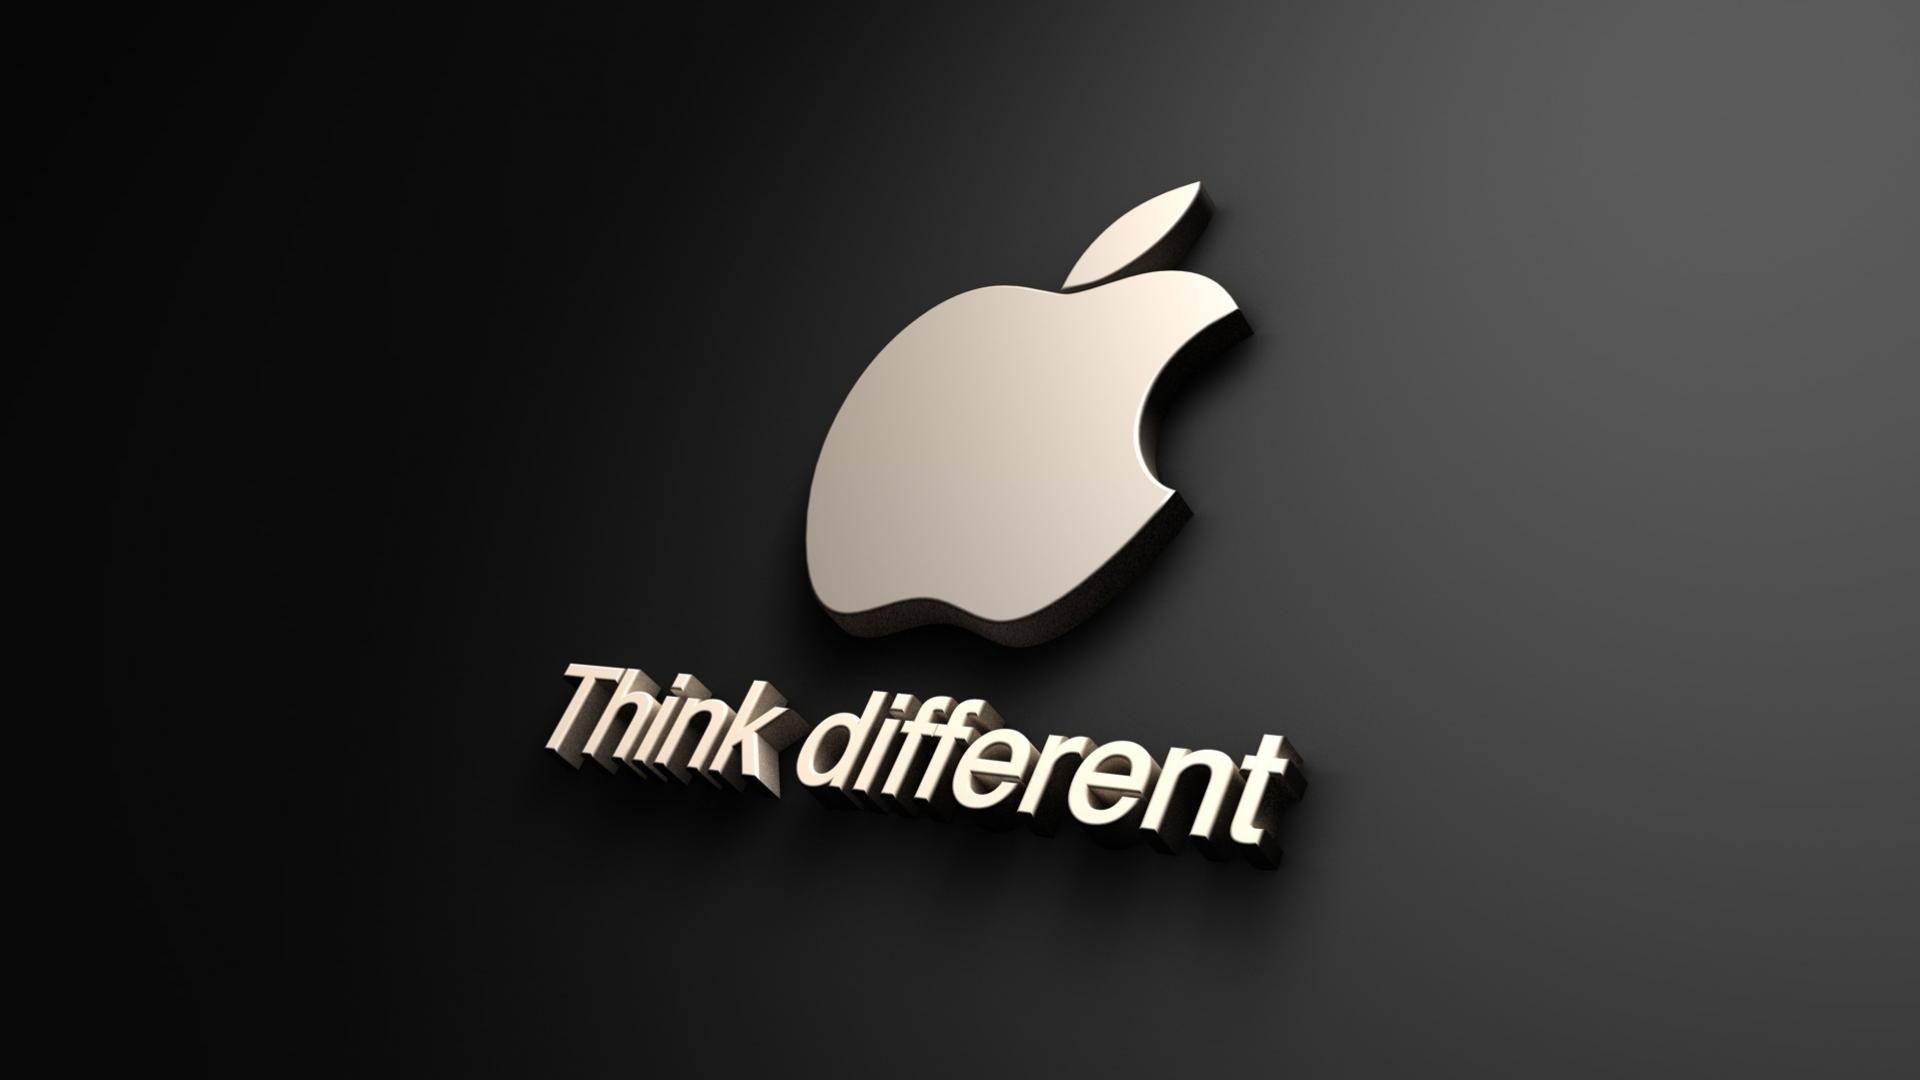 Official Apple Logo Hd Background Wallpaper 21 HD ...